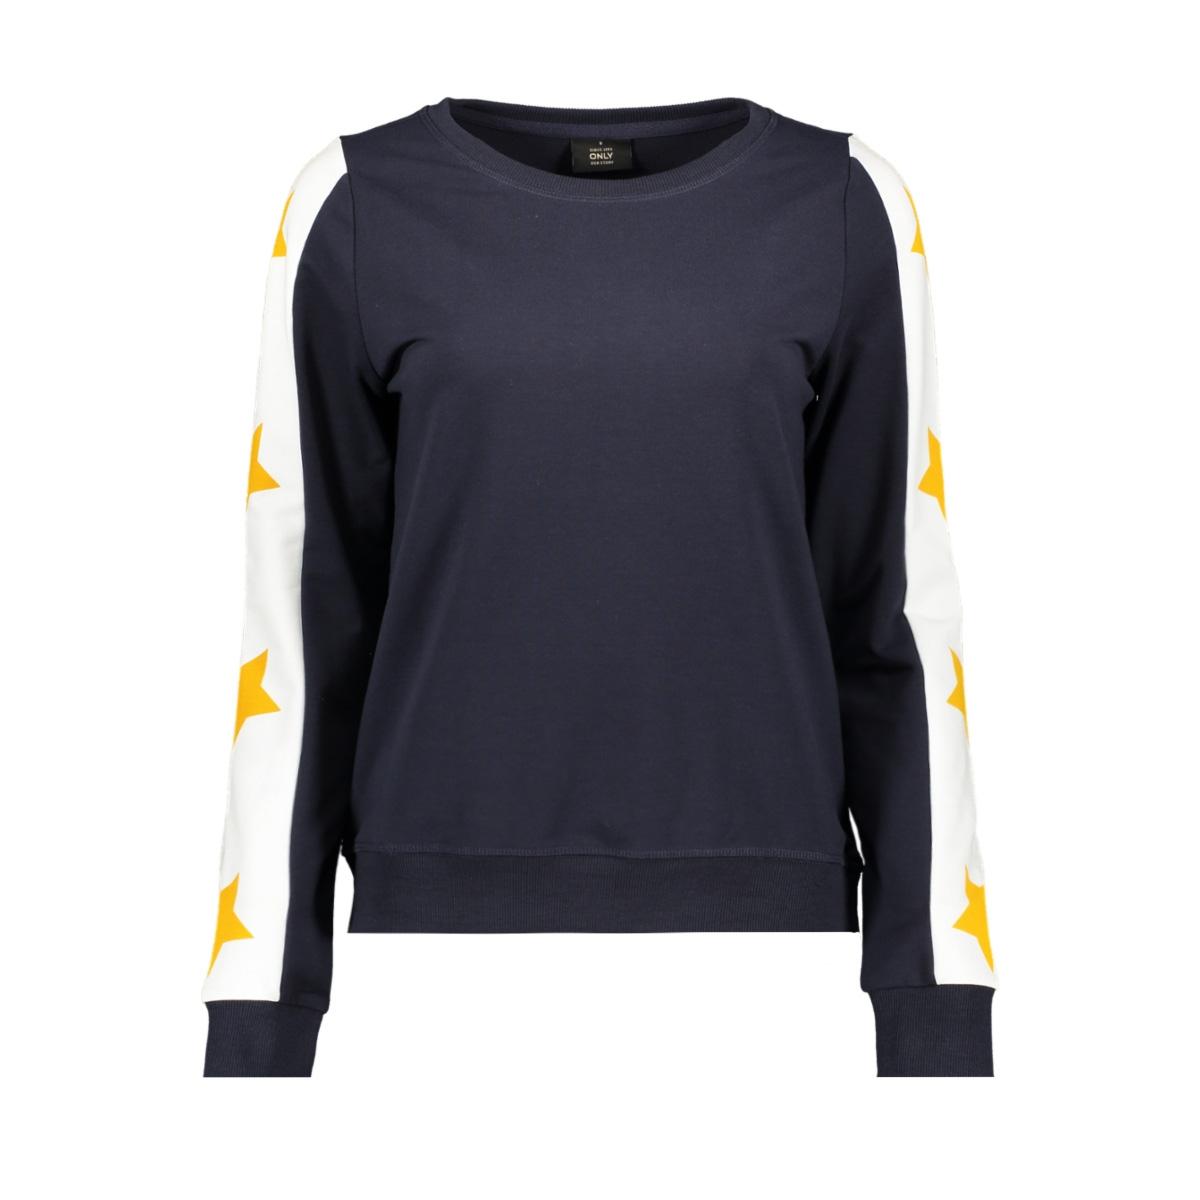 onlpil l/s o-neck cs swt 15174189 only sweater night sky/star mango